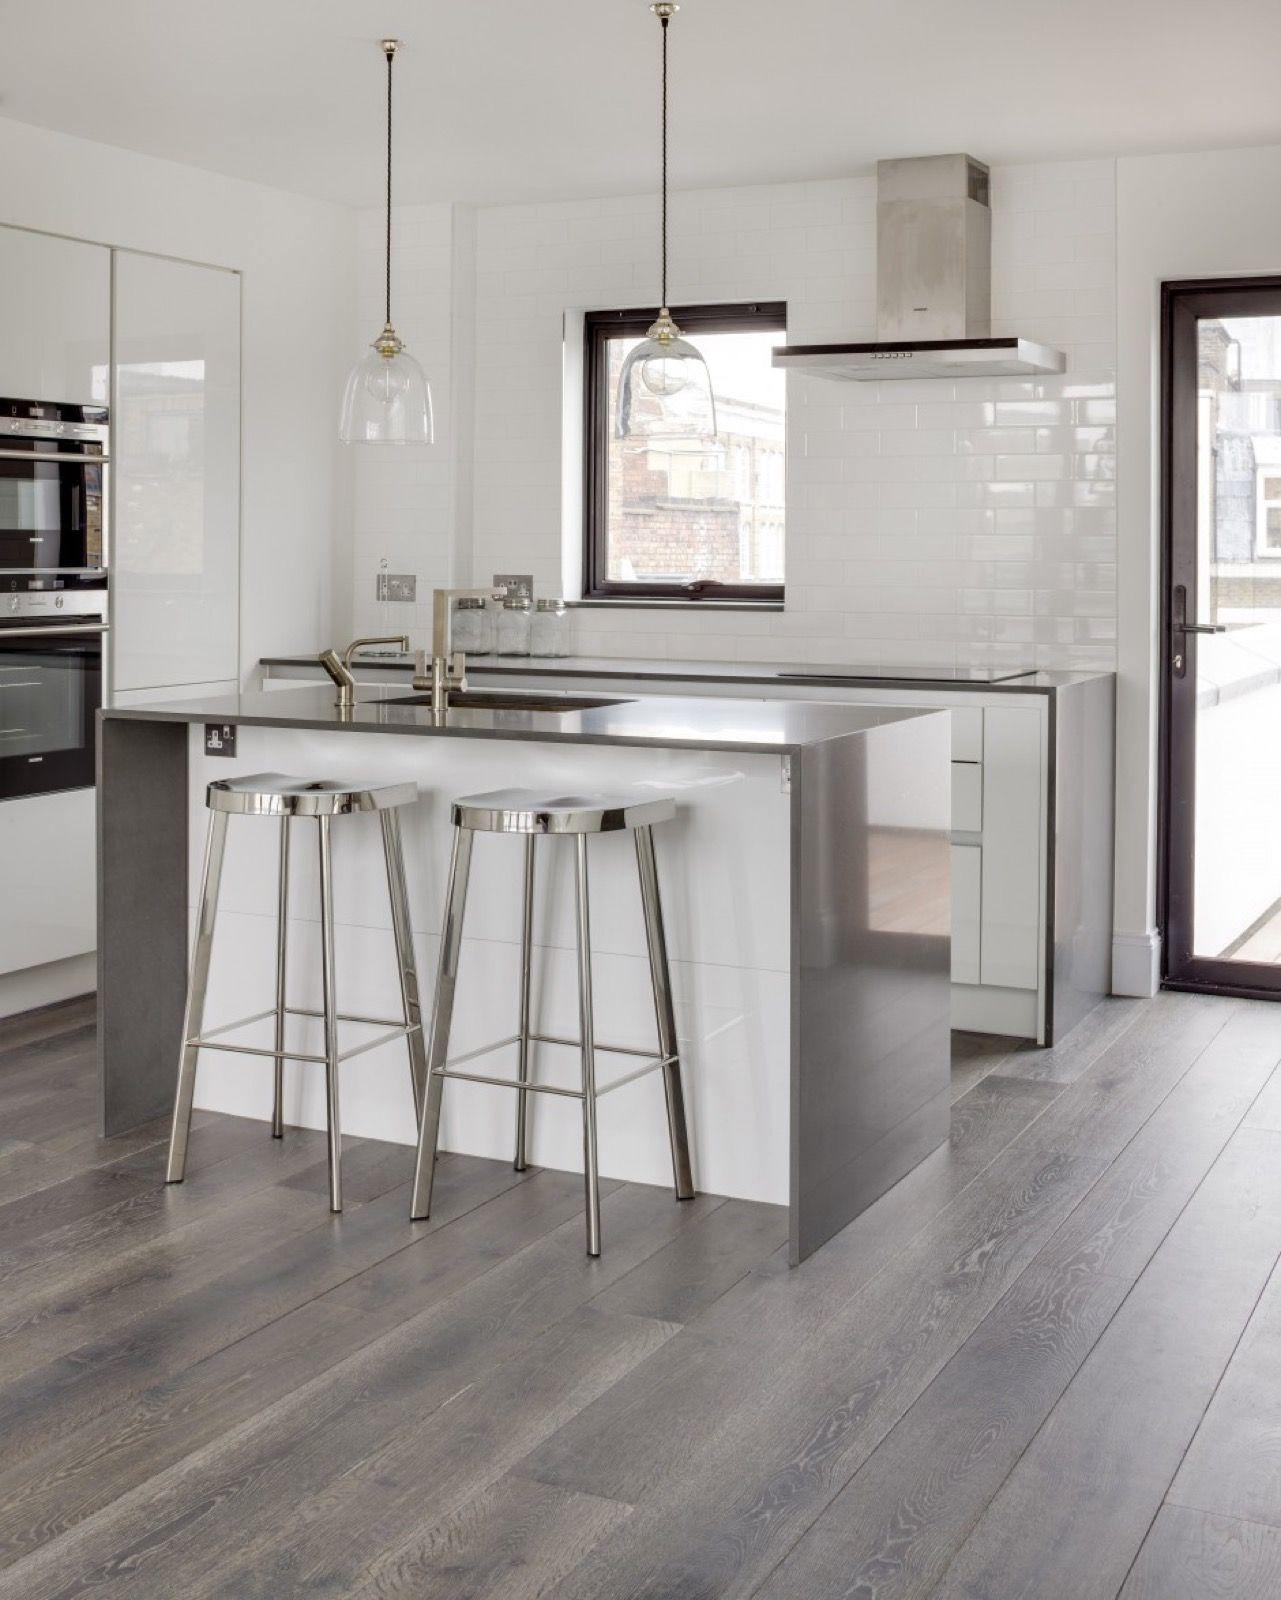 Pin by darla ahern on home   Pinterest   Wood walls, Wood flooring ...